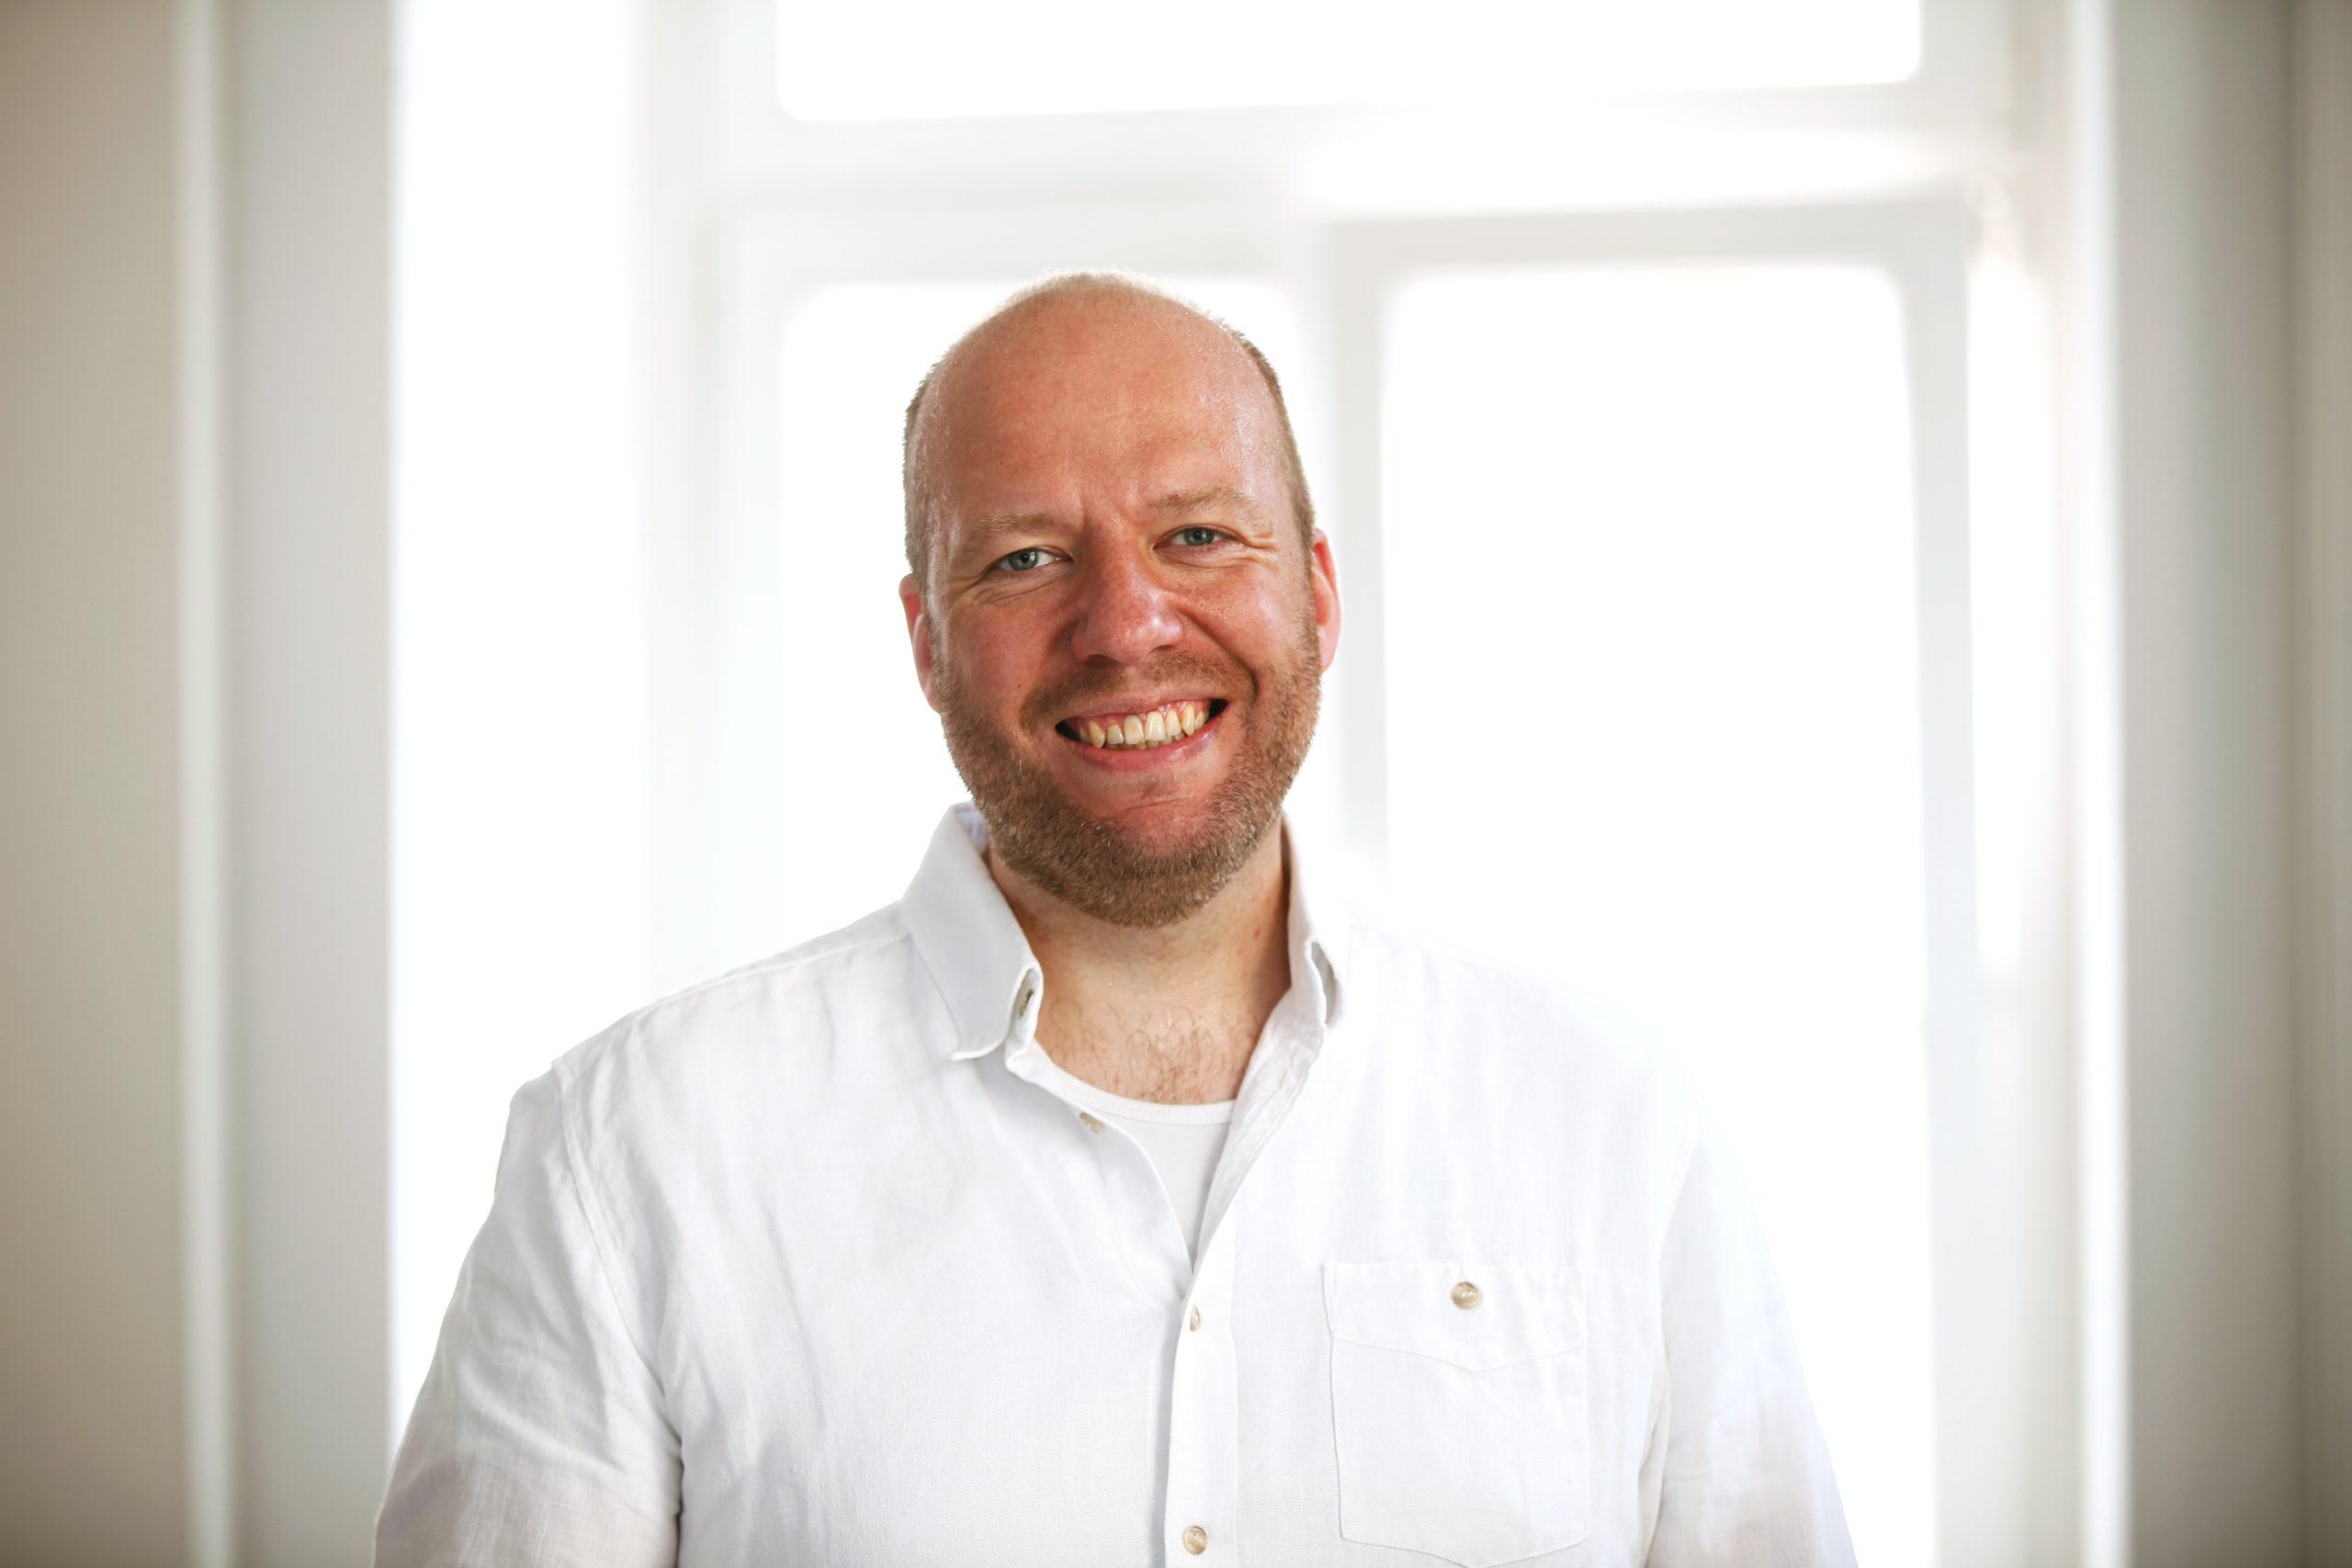 Daniel Wendring